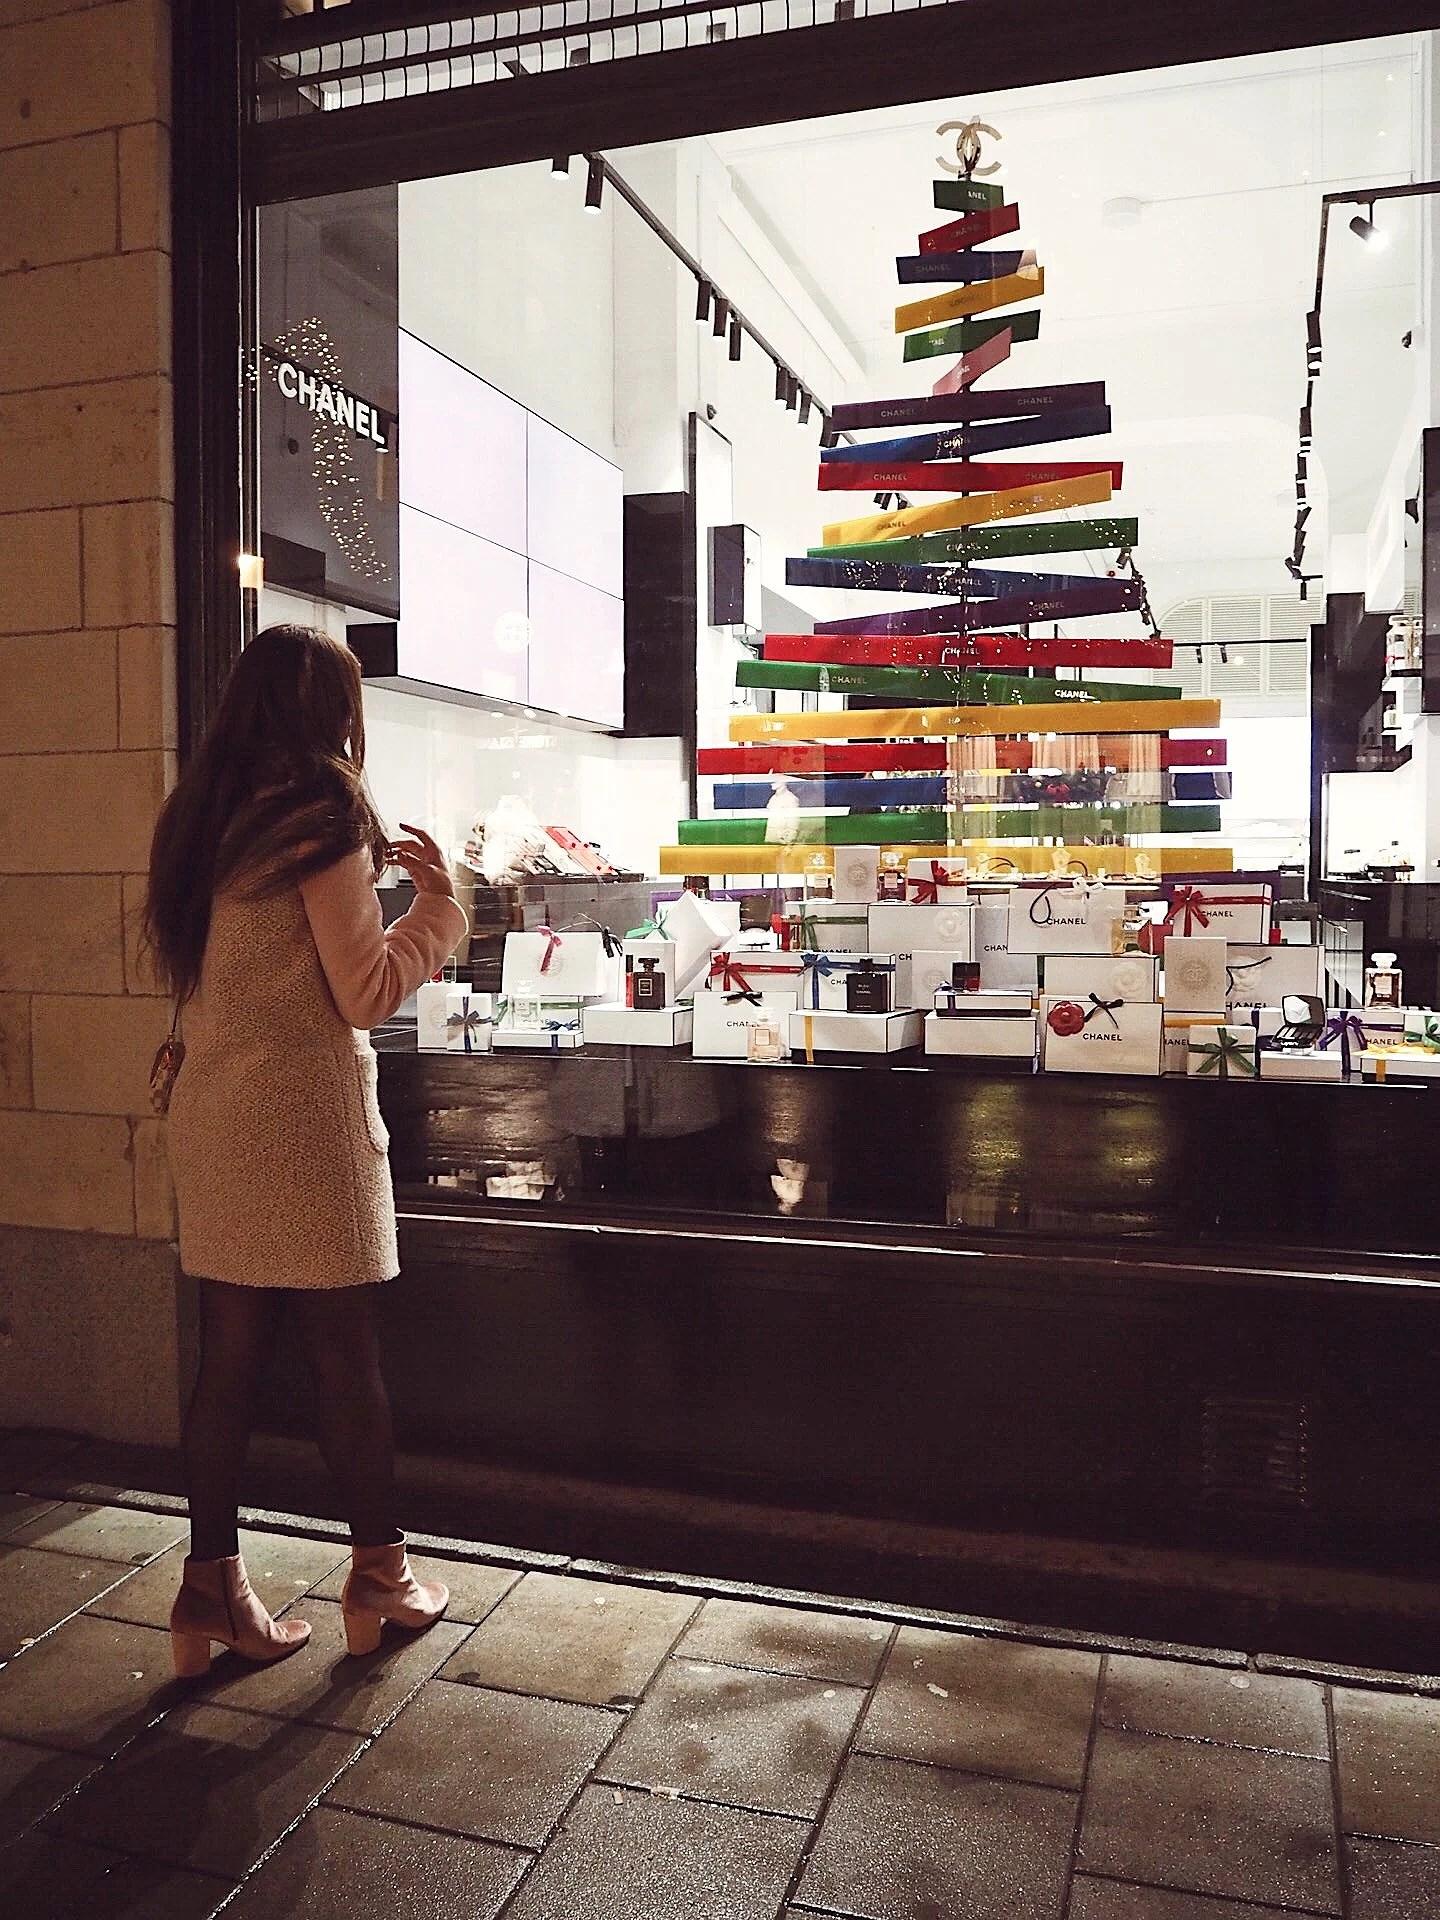 Chanel beauty boutique